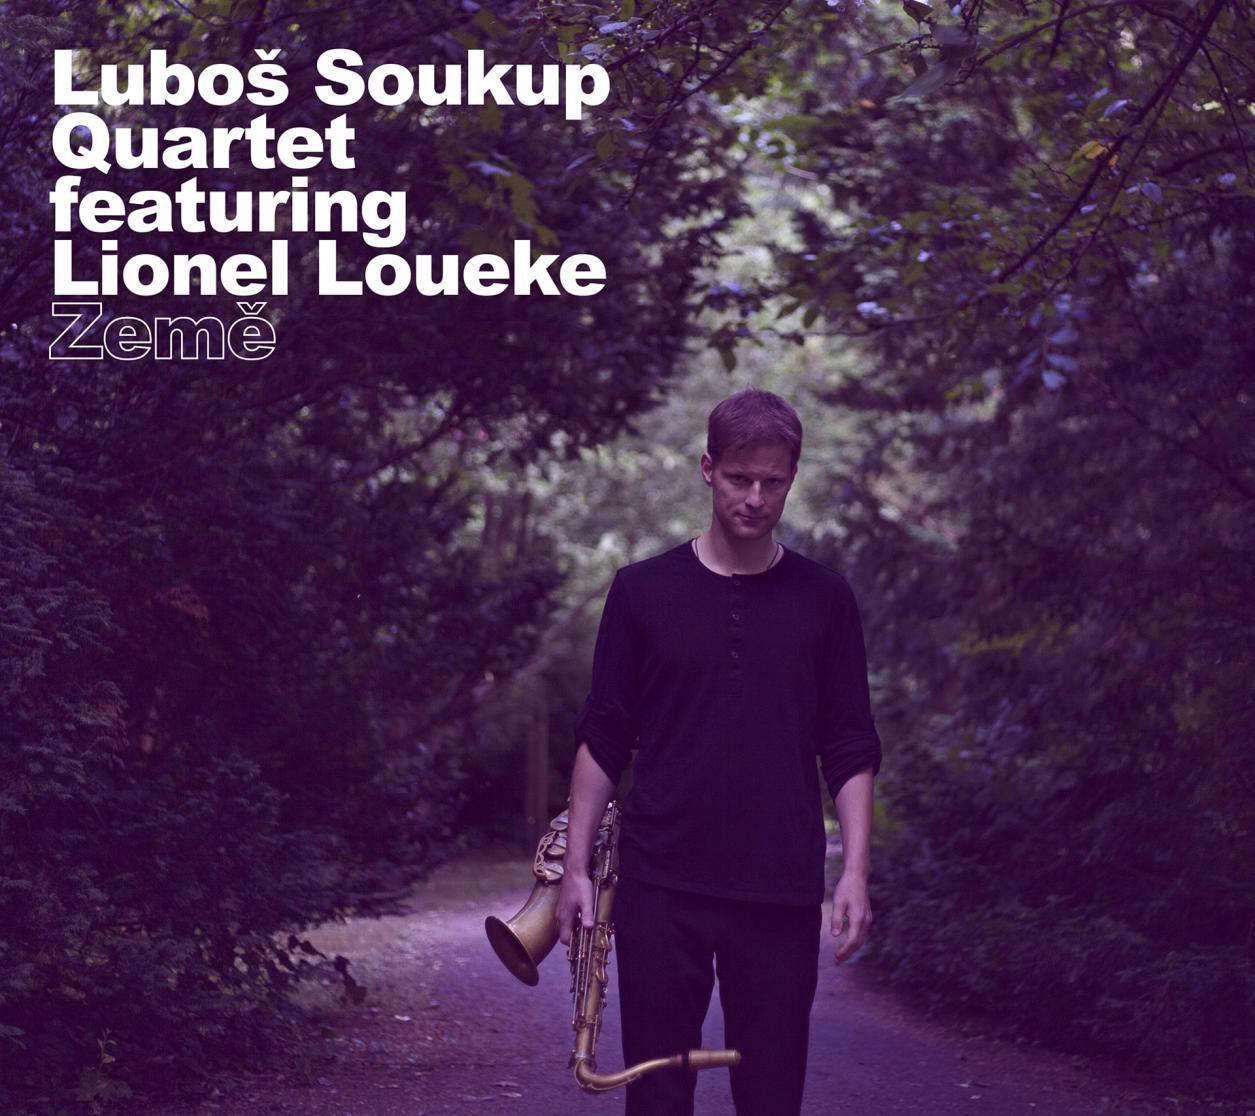 Luboš Soukup featuring Lionel Loueke: Země